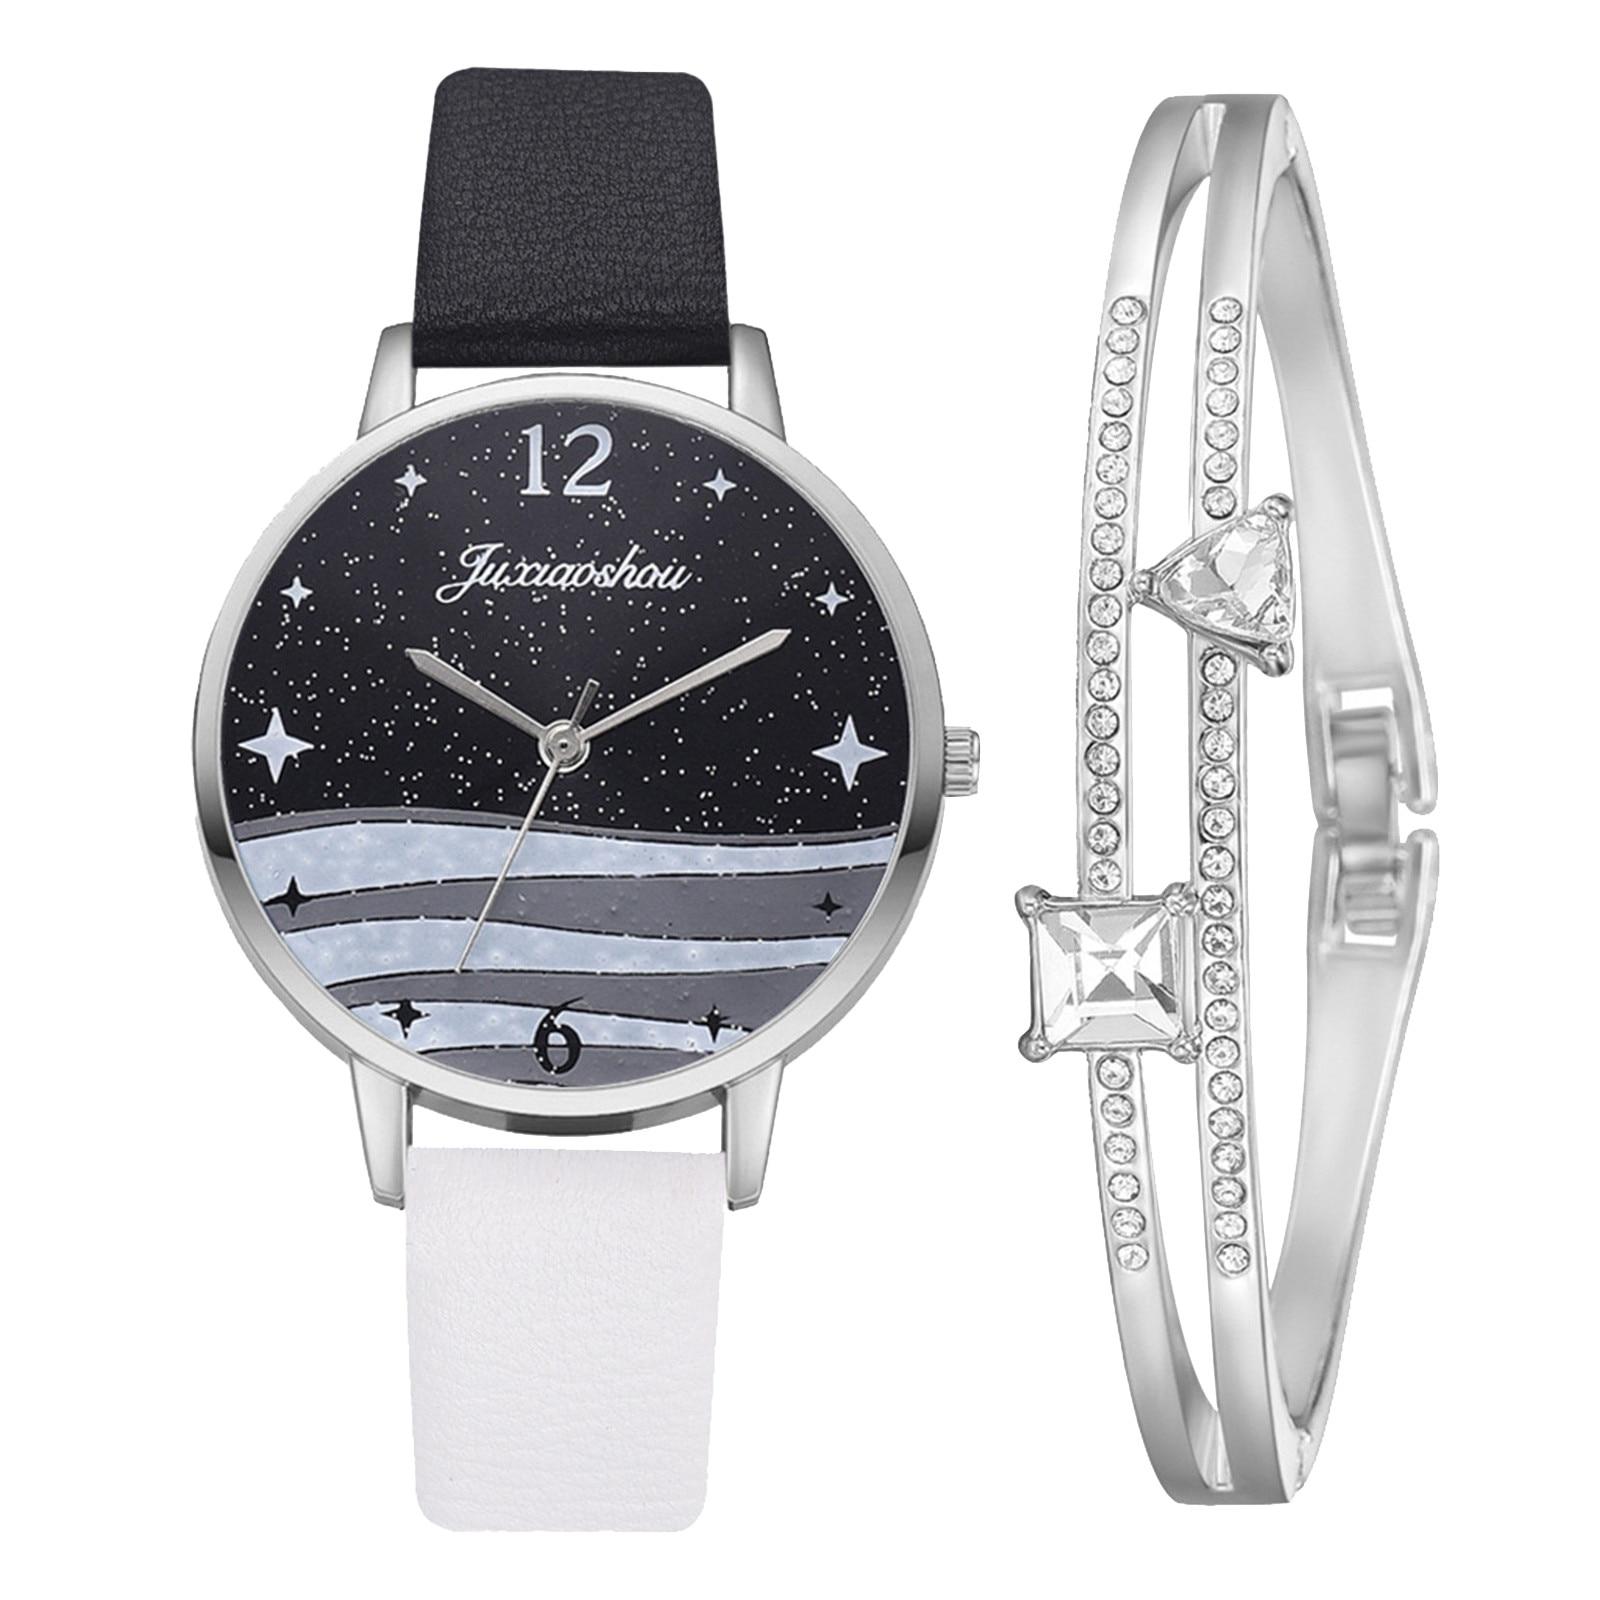 5pcs Set Top Style Fashion Women's Luxury Leather Band Analog Quartz WristWatch Ladies Watch Women D